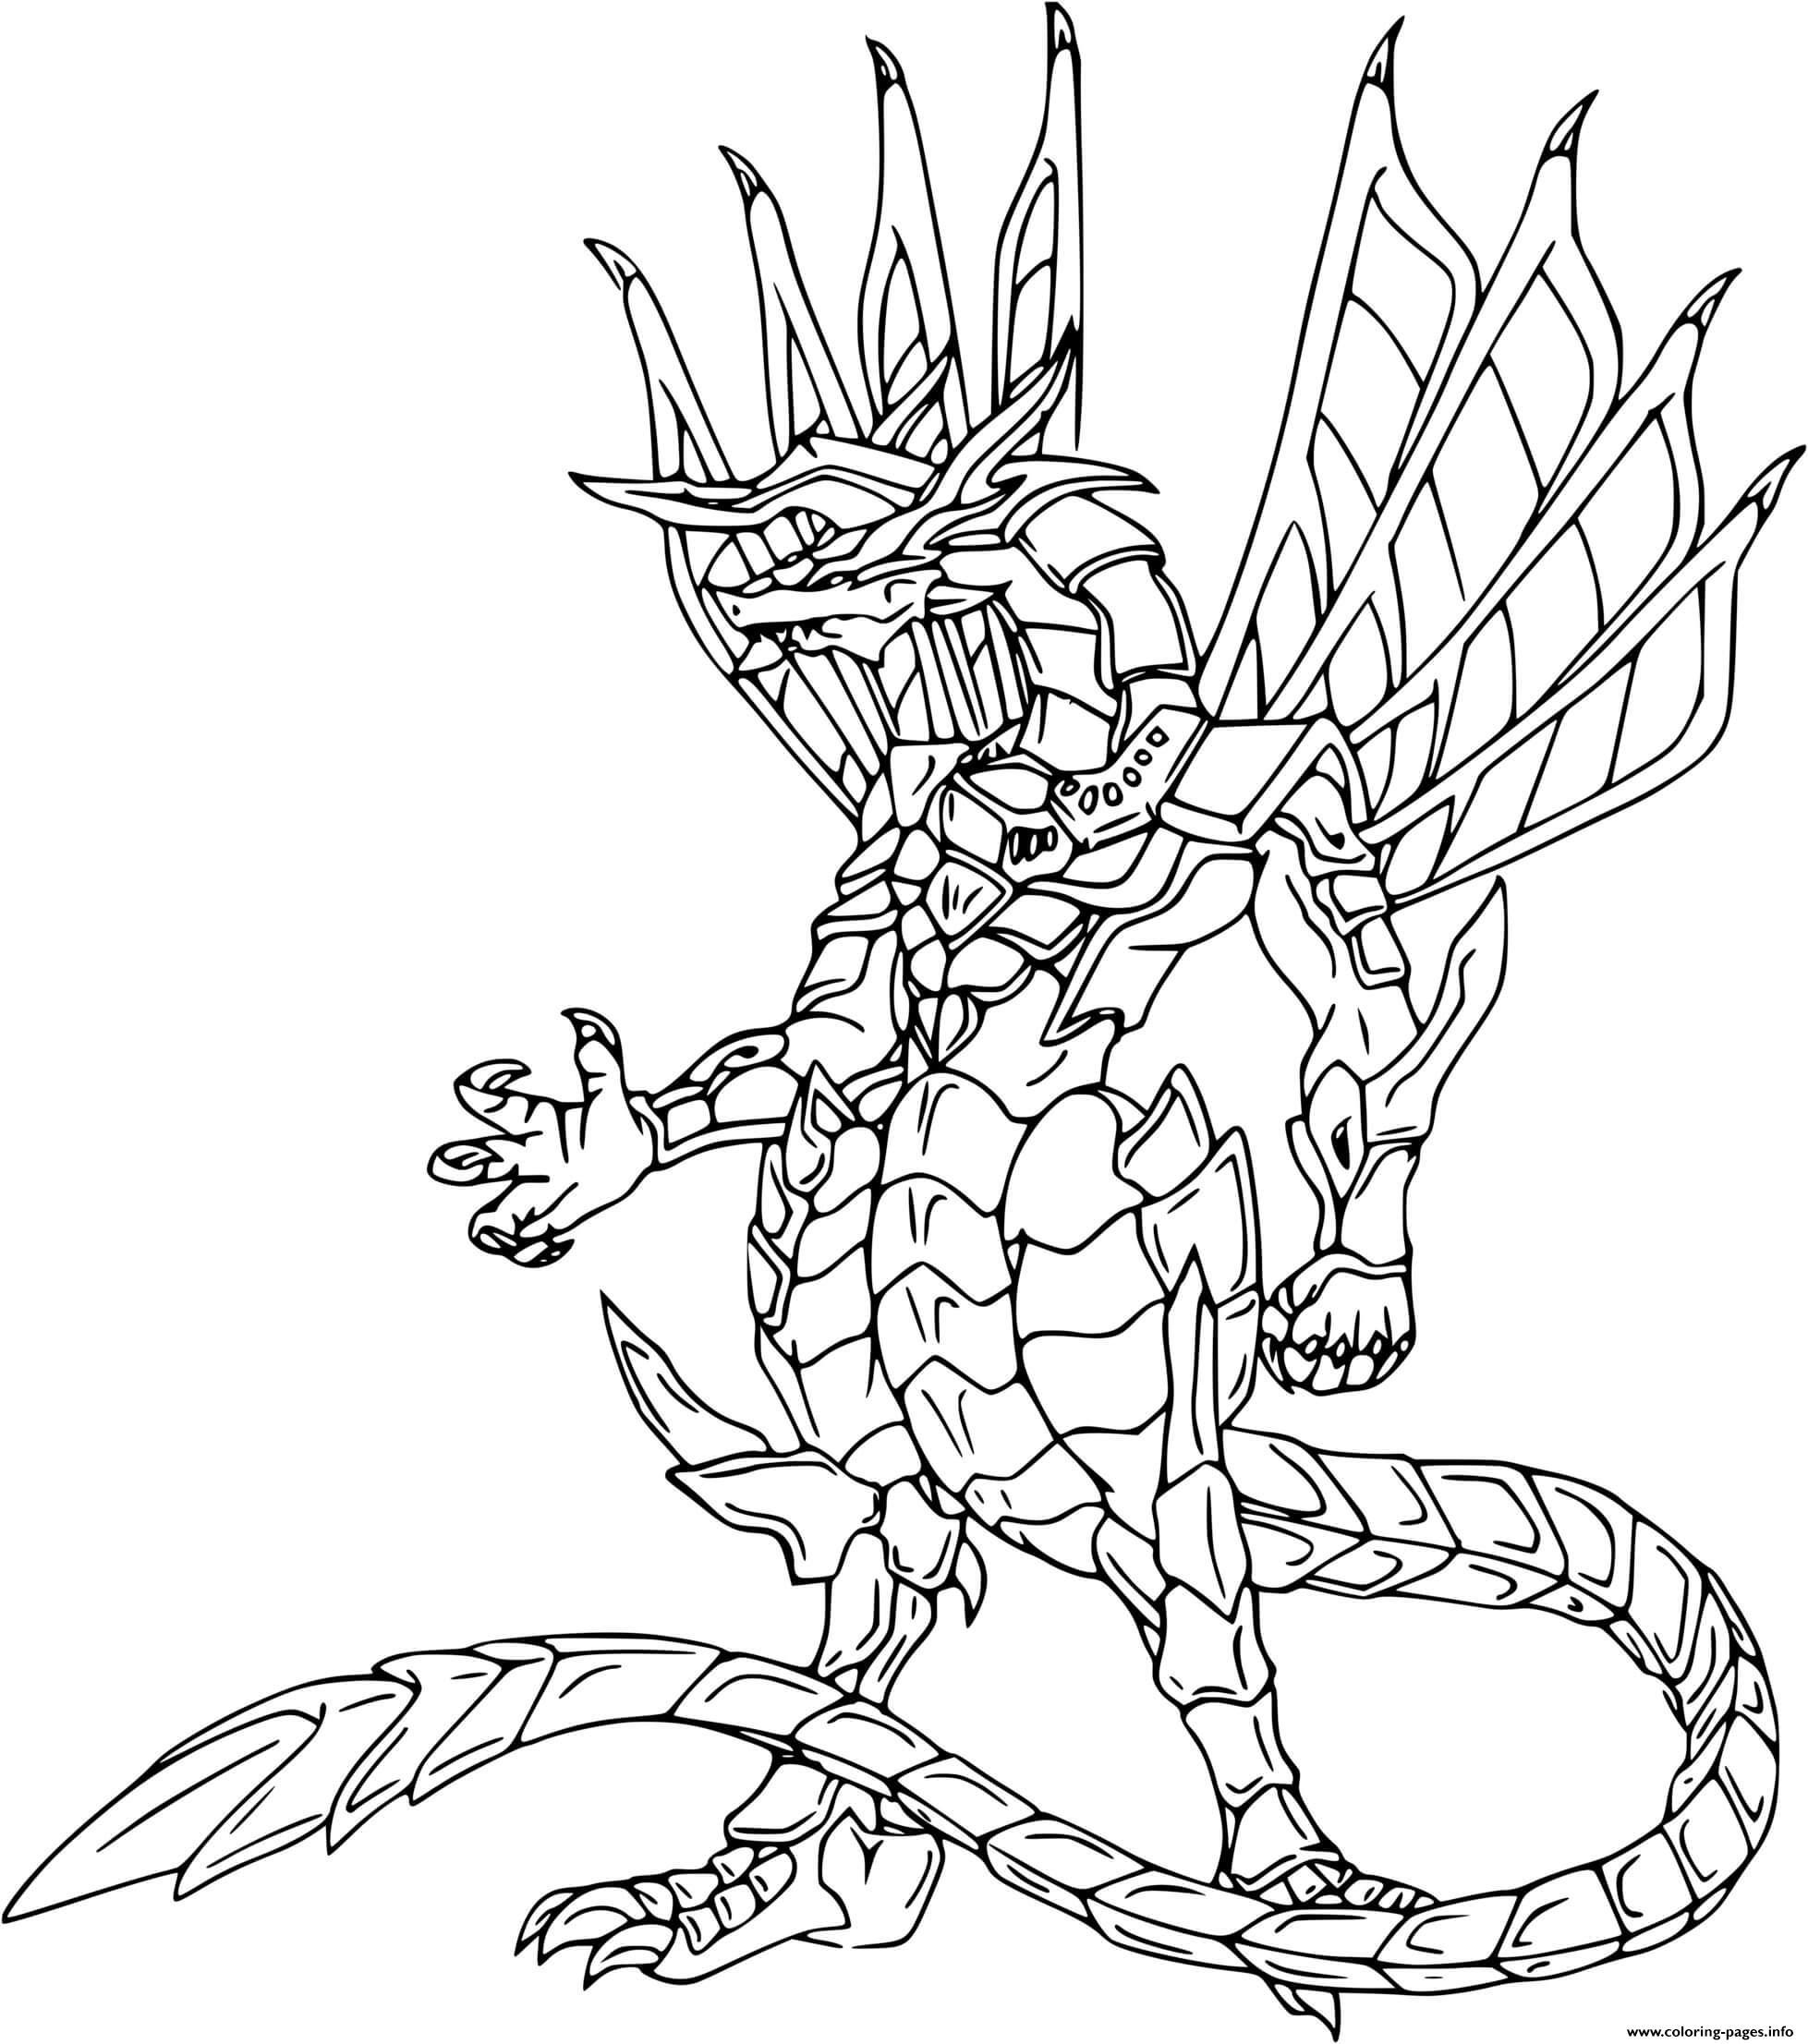 Bakugan Drago Coloring Pages Printable